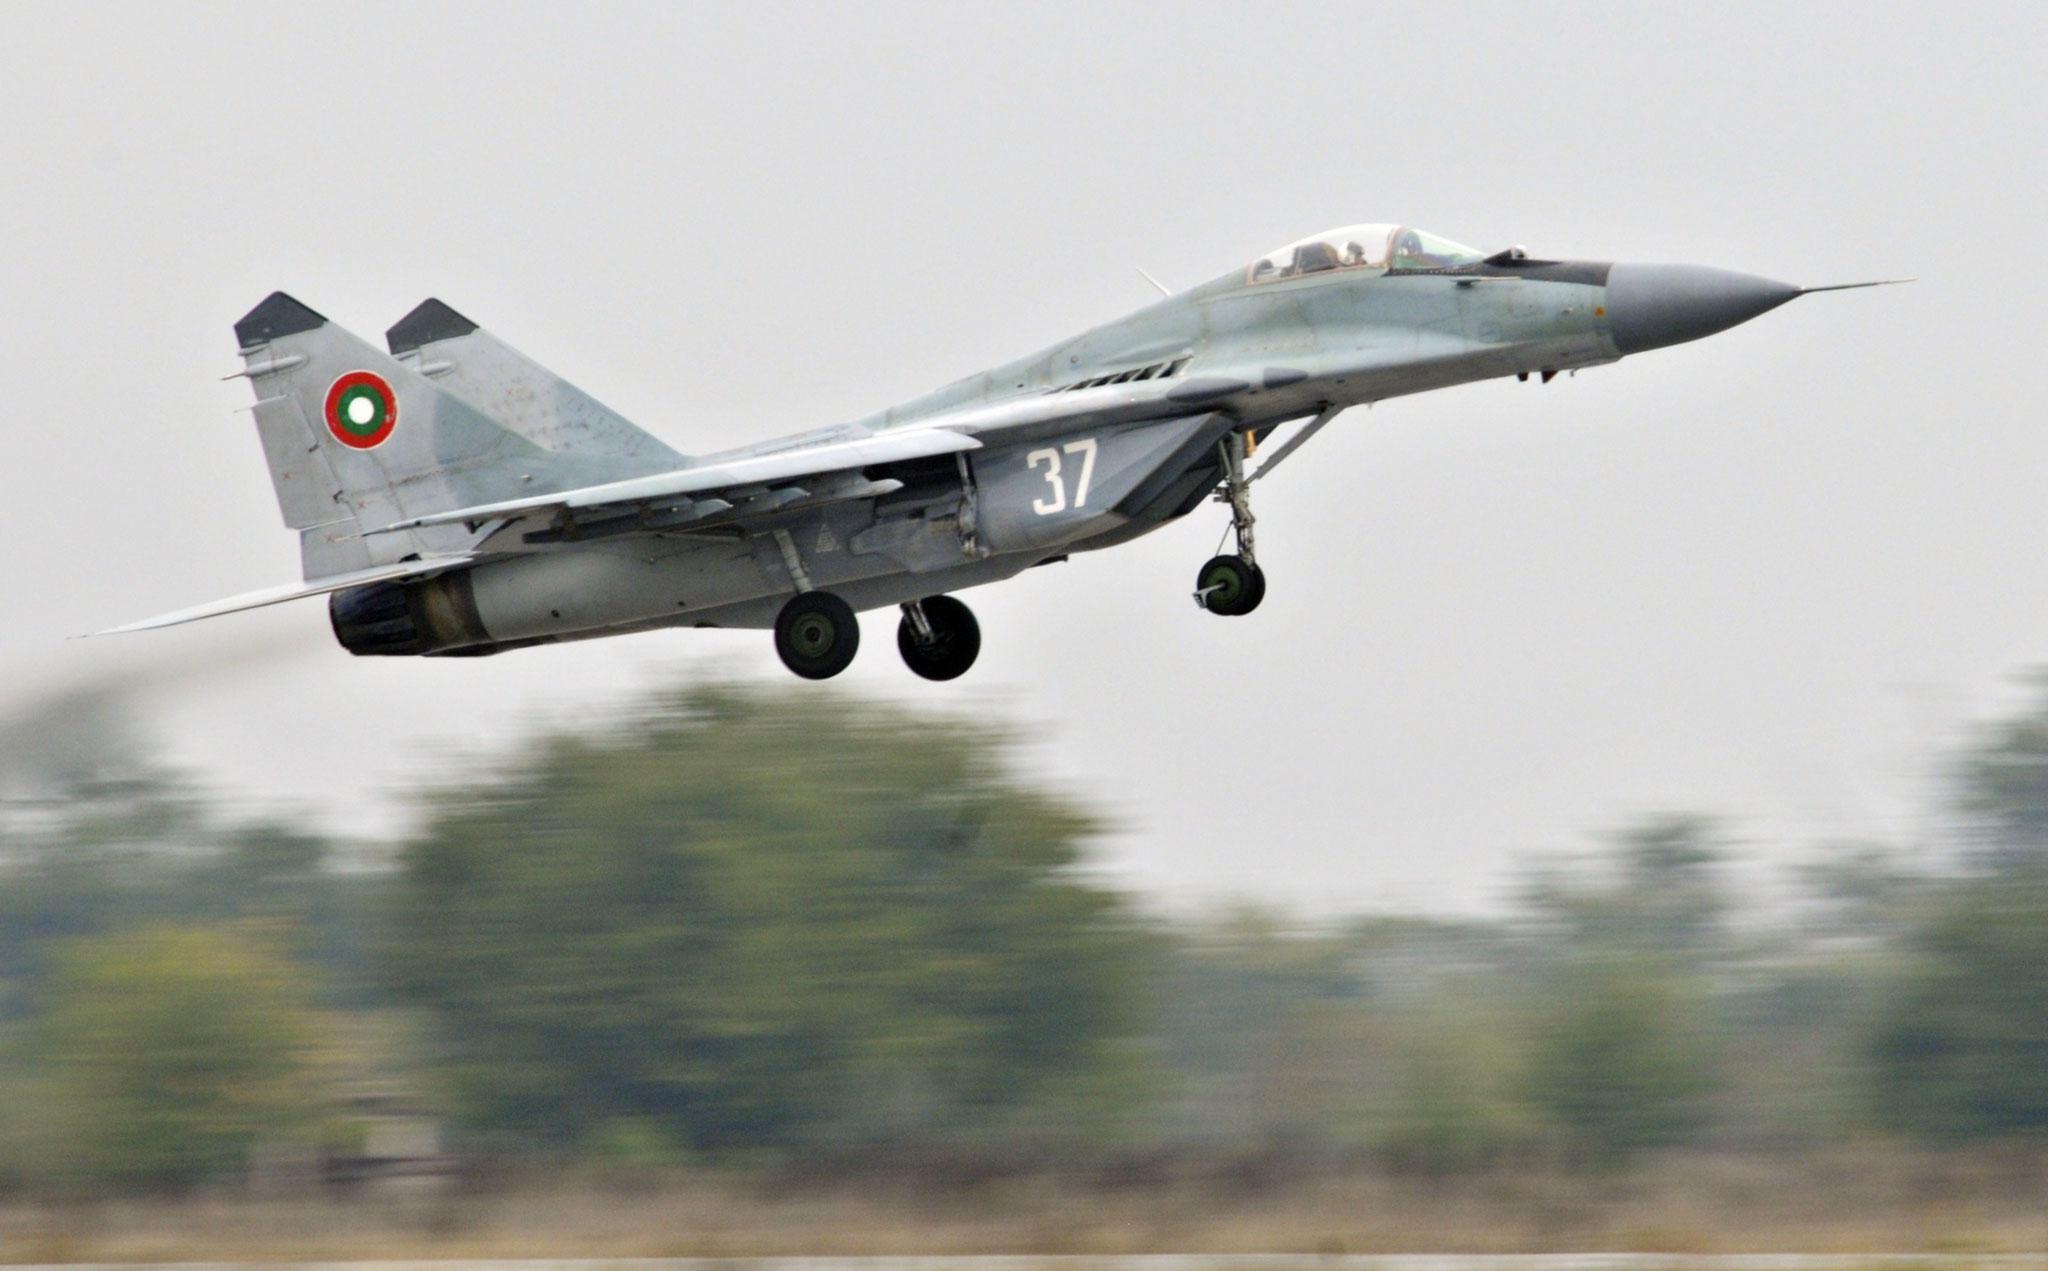 MiG-29UB ormai giunti a fine carriera.